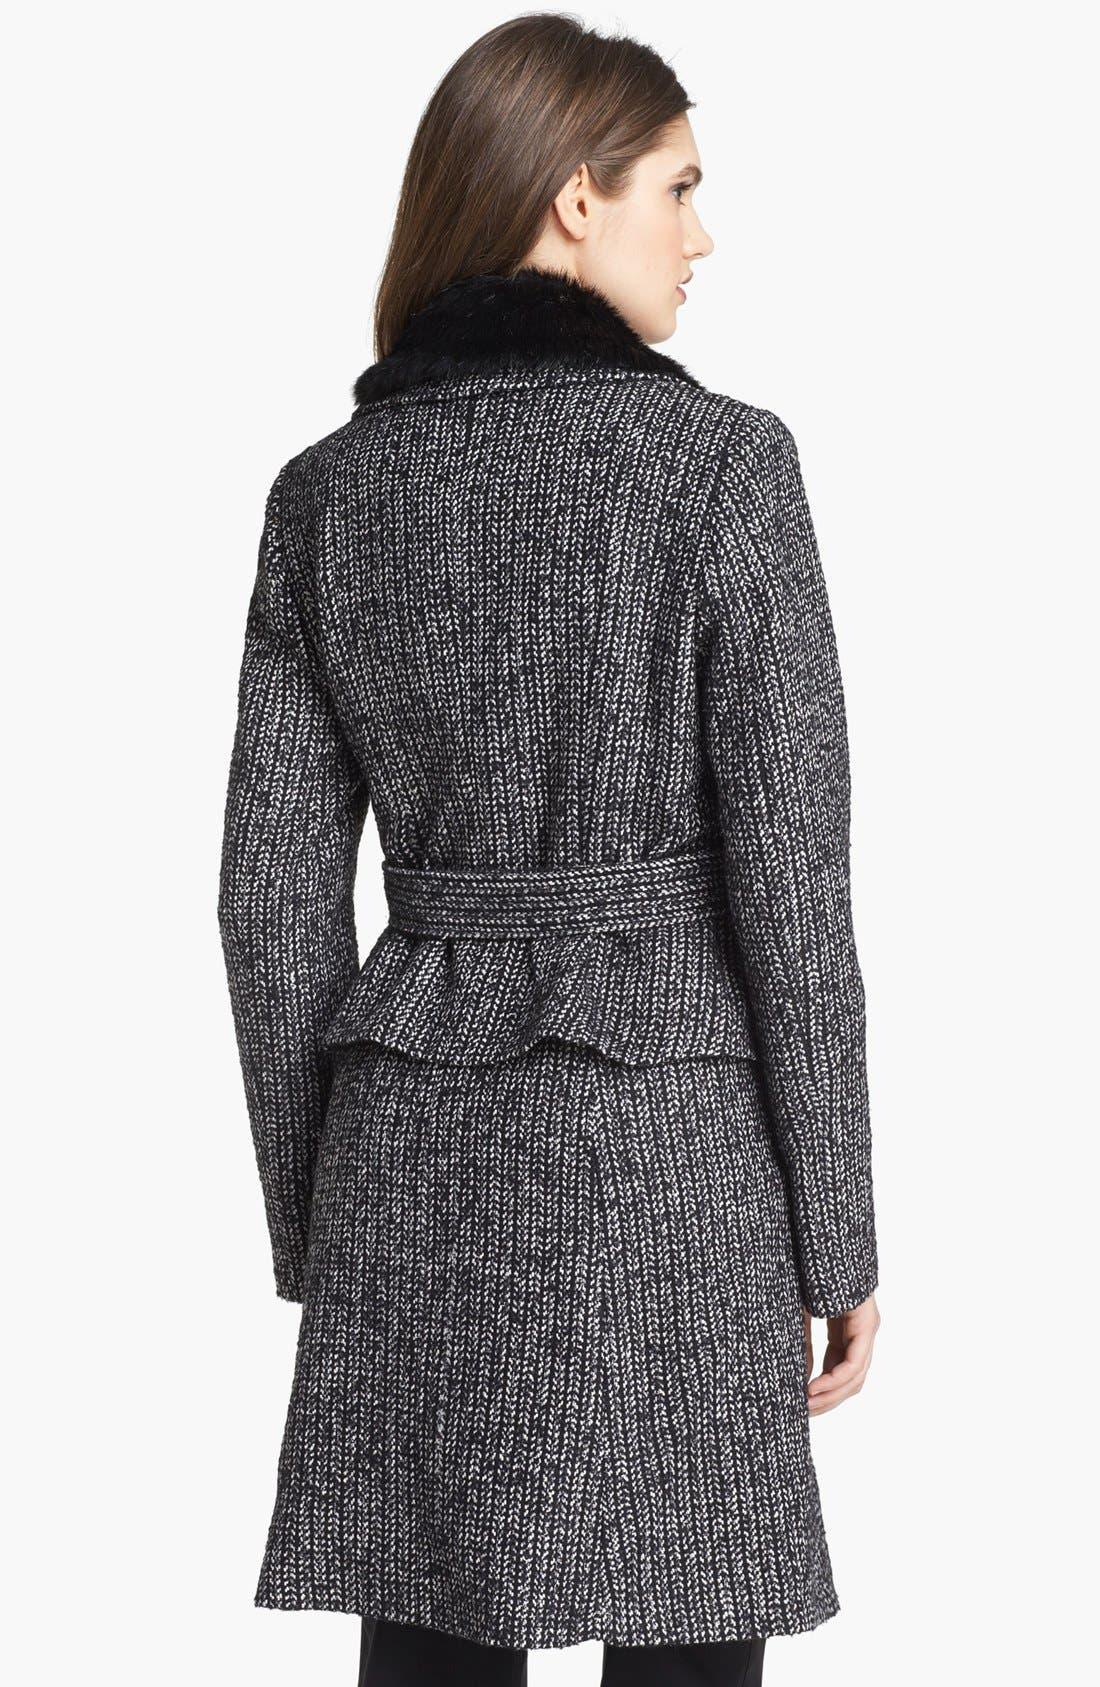 Alternate Image 2  - Ivanka Trump Belted Tweed Coat with Detachable Faux Fur Collar